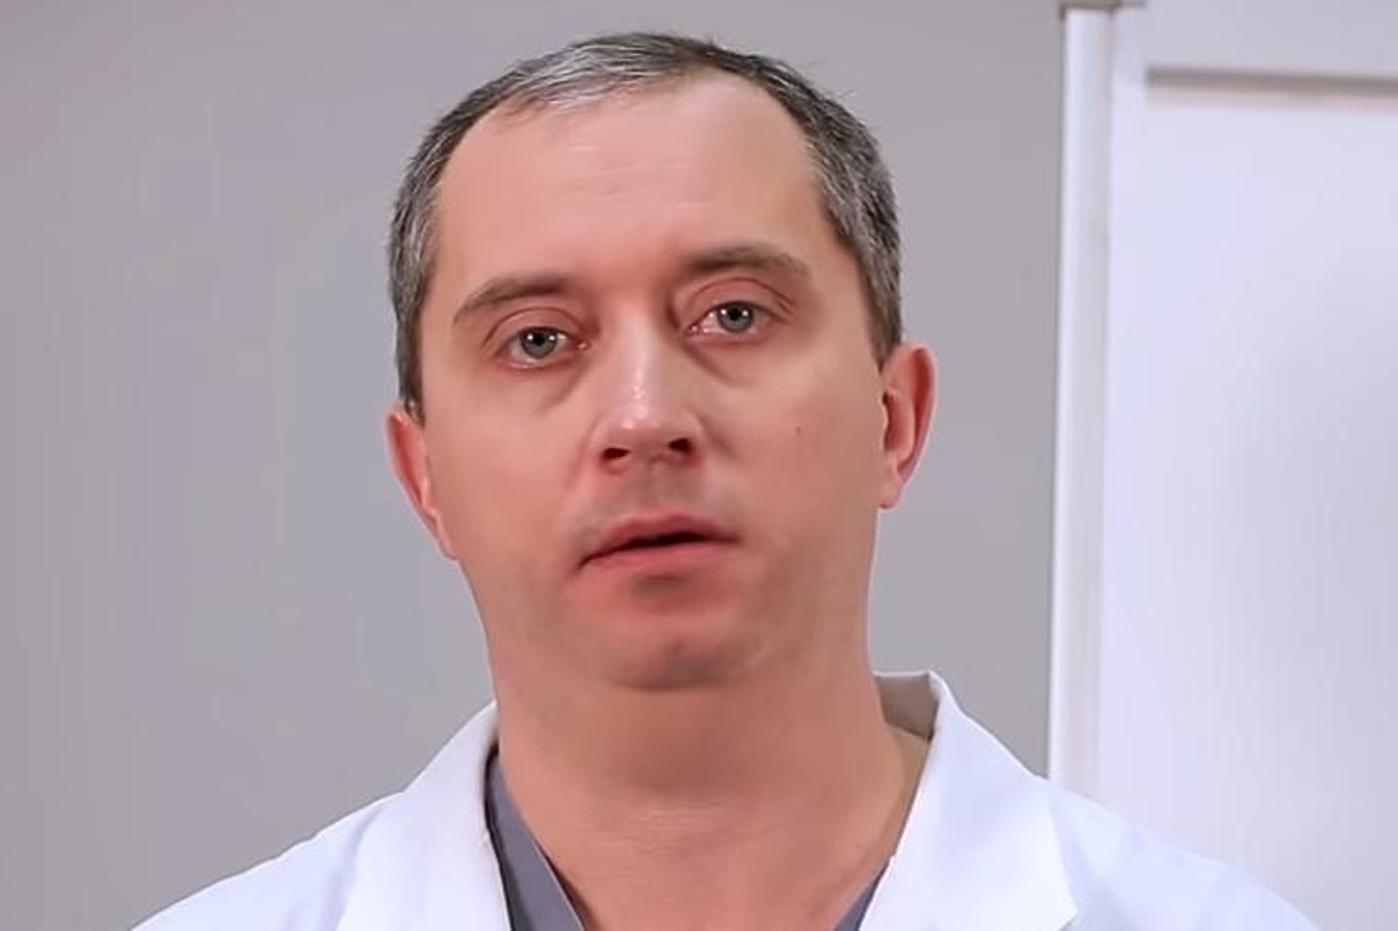 najbolja hipertenzija klinika)